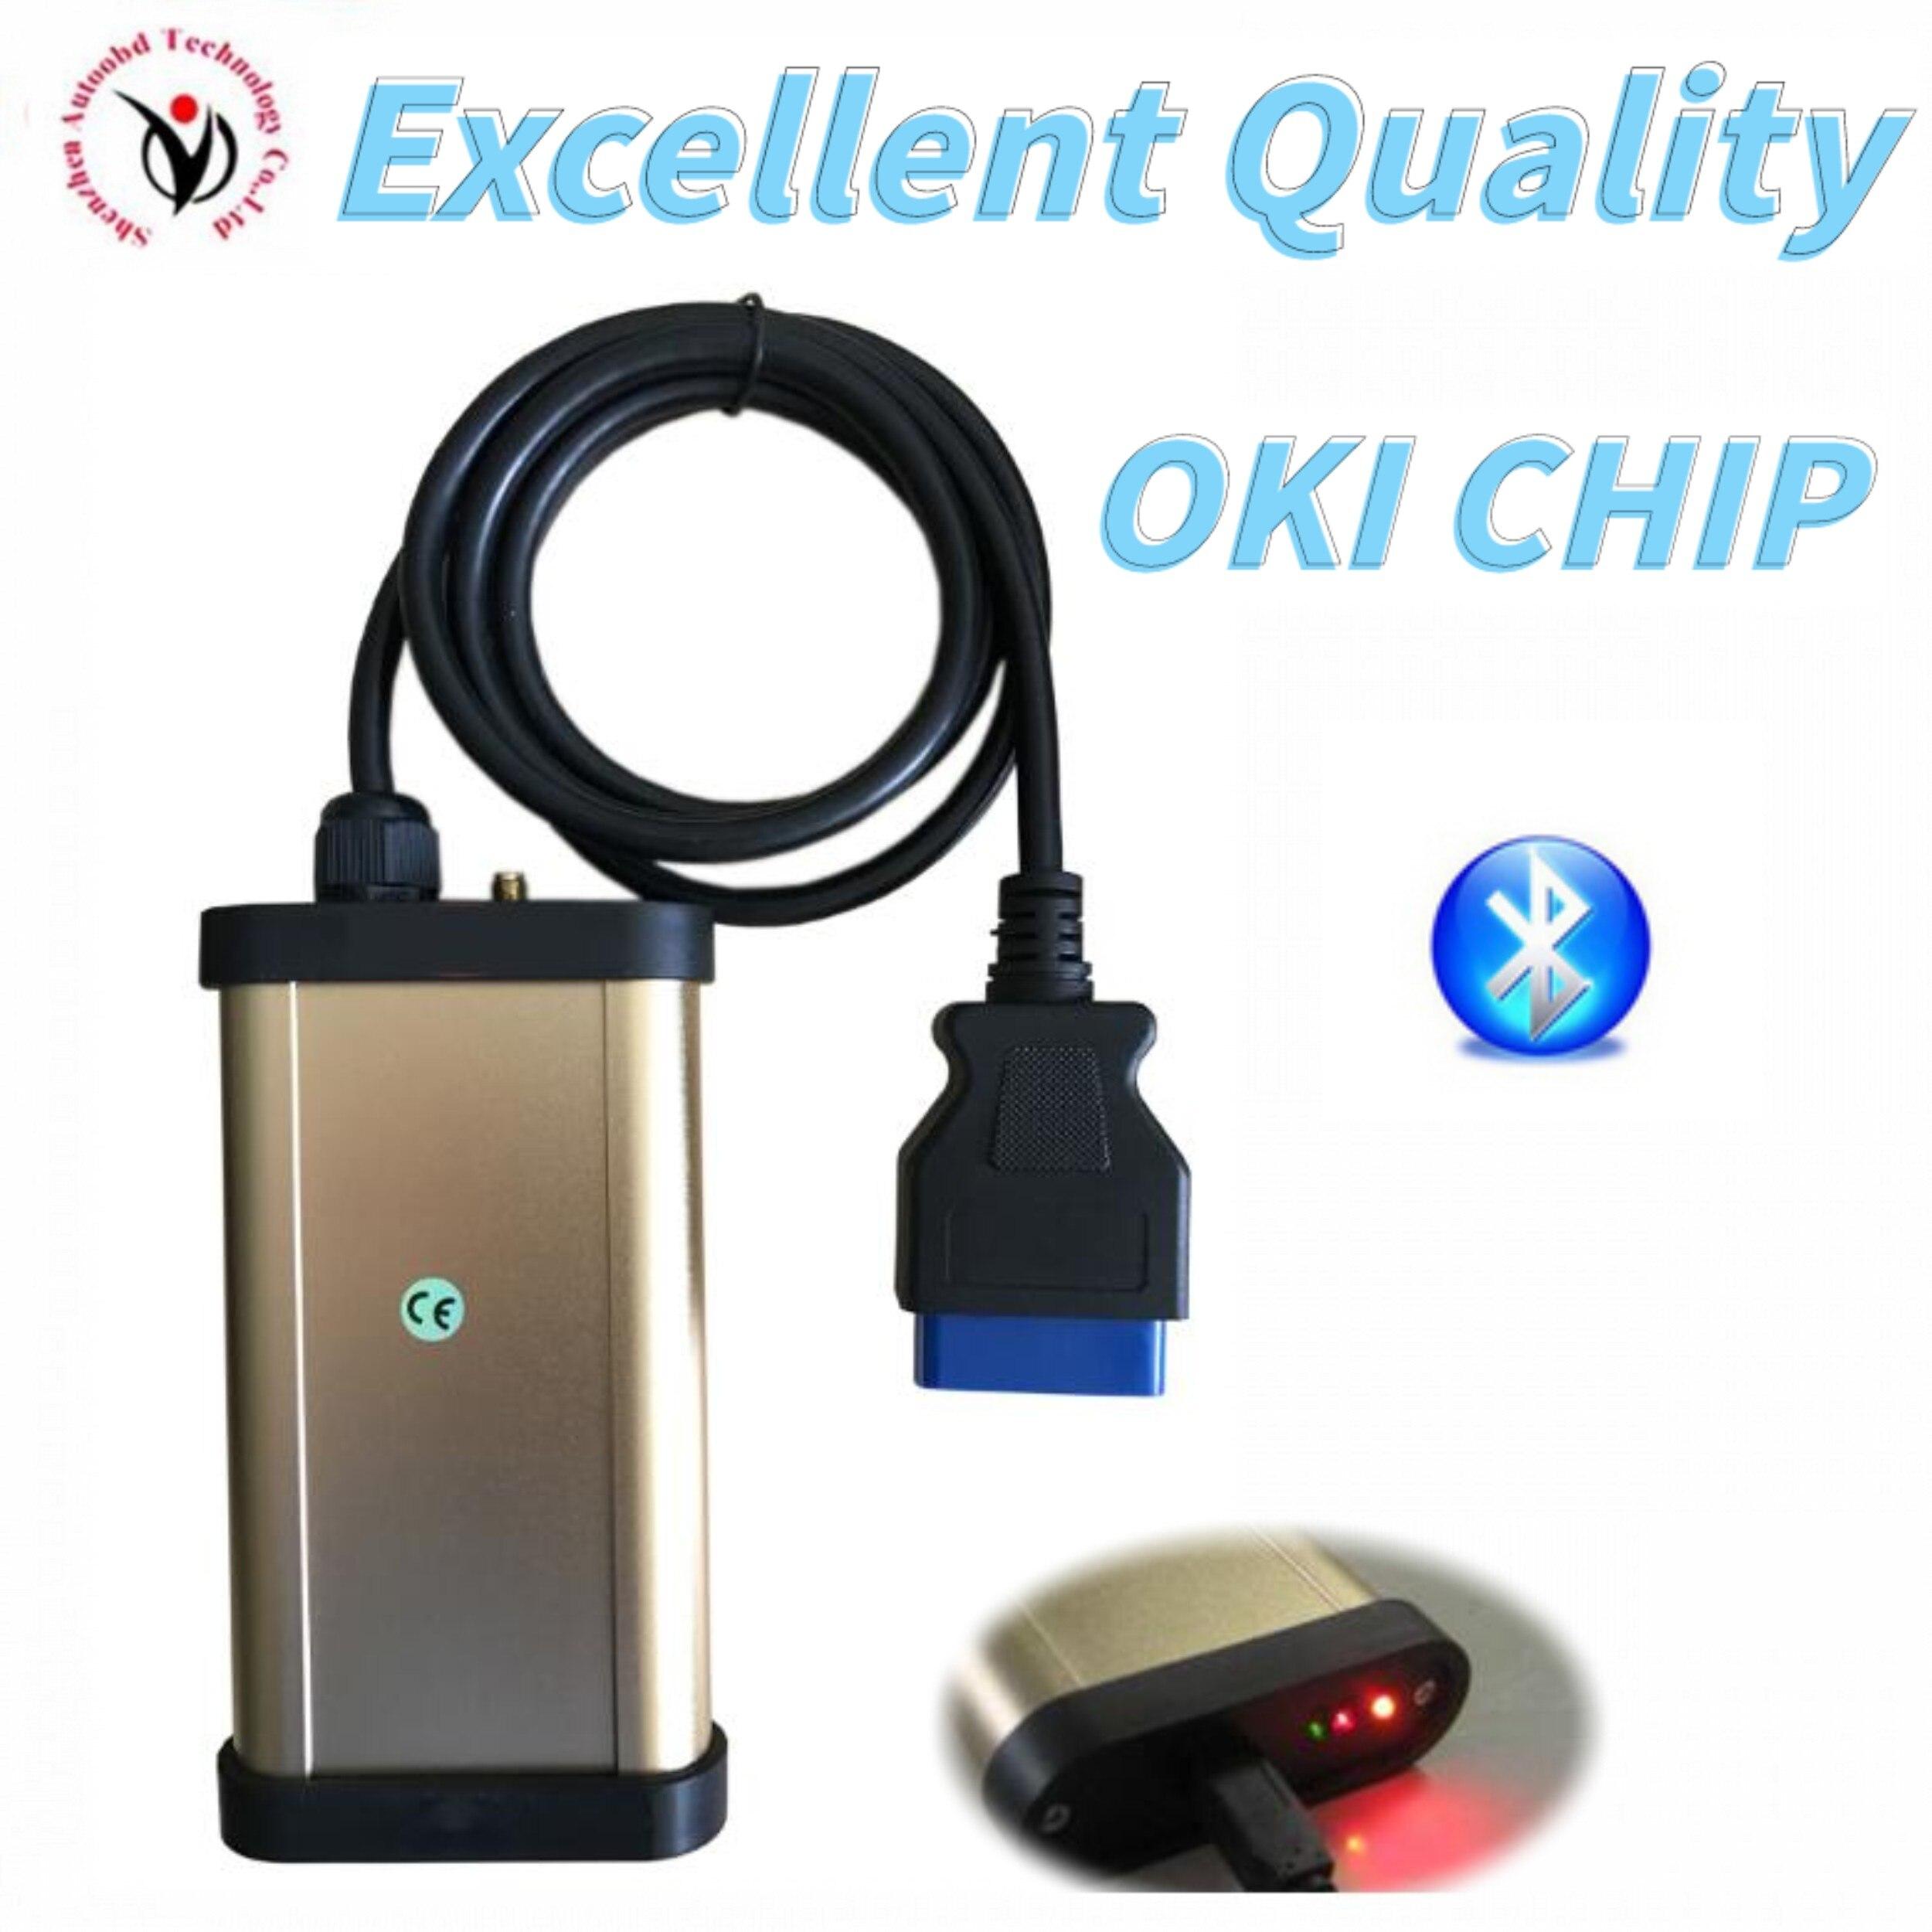 2020 Best VD TCS CDP PRO Plus 2016.R0 Free Keygen Oki Chip Bluetooth Vd Ds150e Cdp For Delphis Car Truck OBD2 Diagnostic Tool